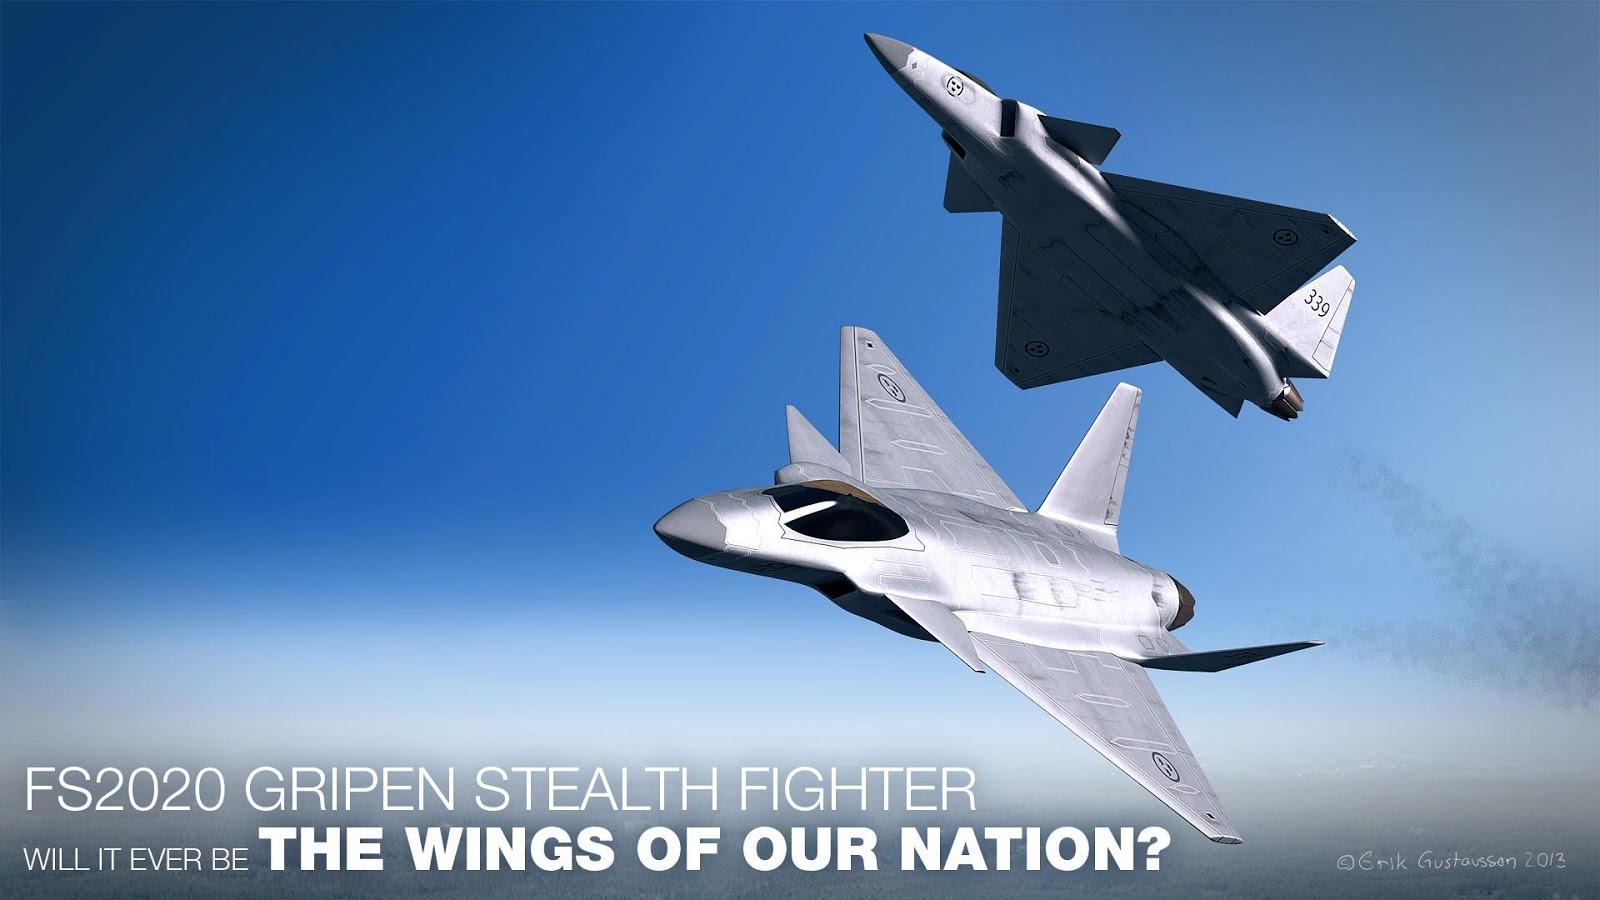 Parceira entre SAAB e Boeing se desenha para o programa T-X